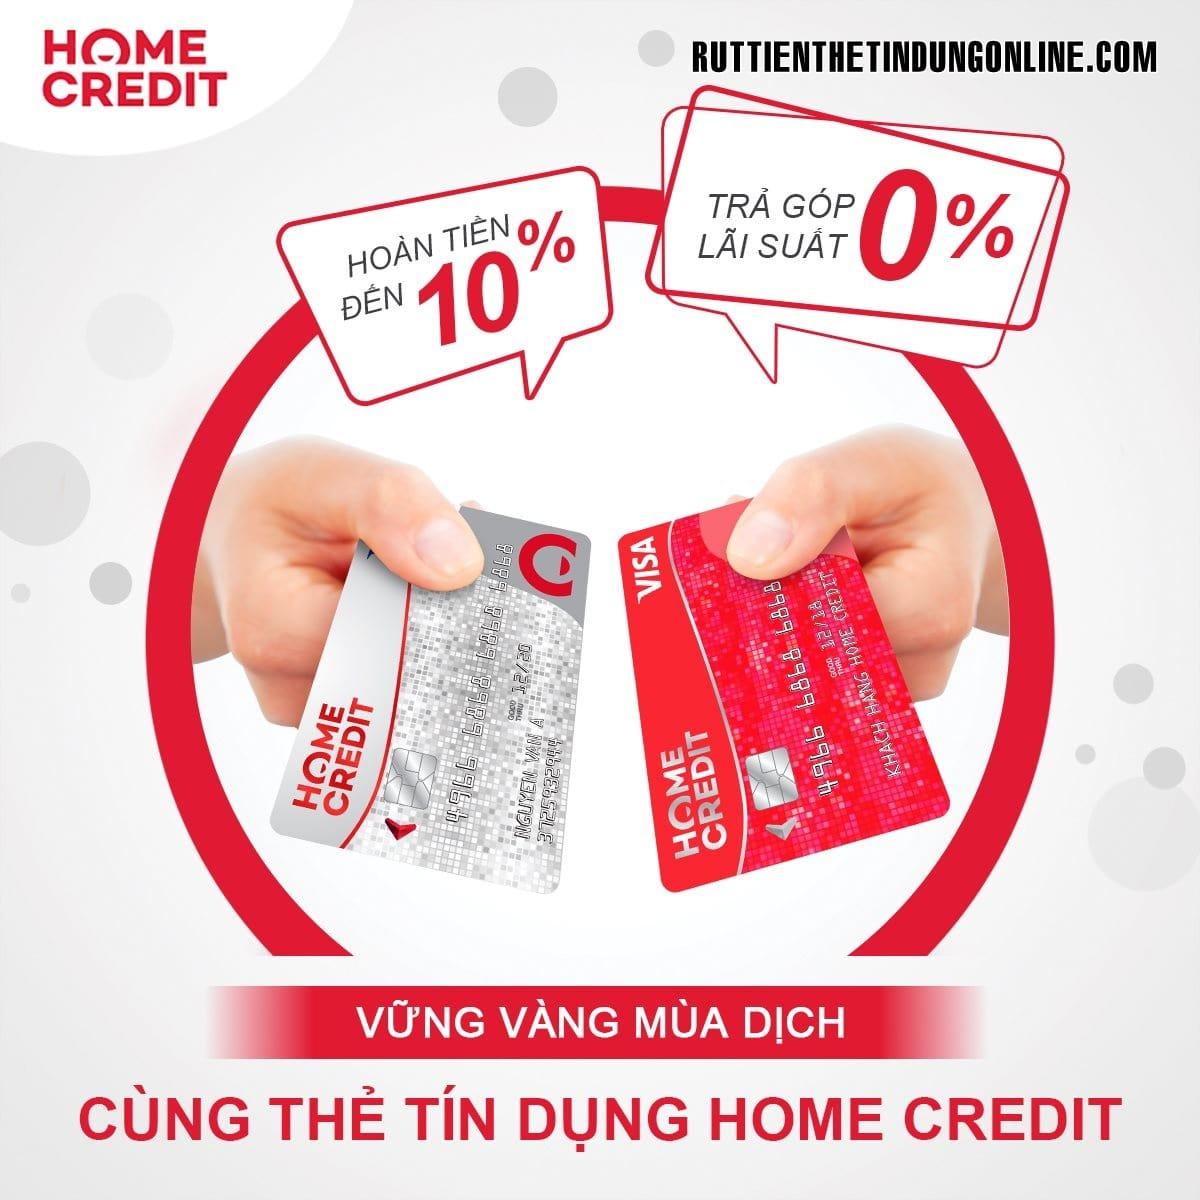 the tin dung home credit co tot khong